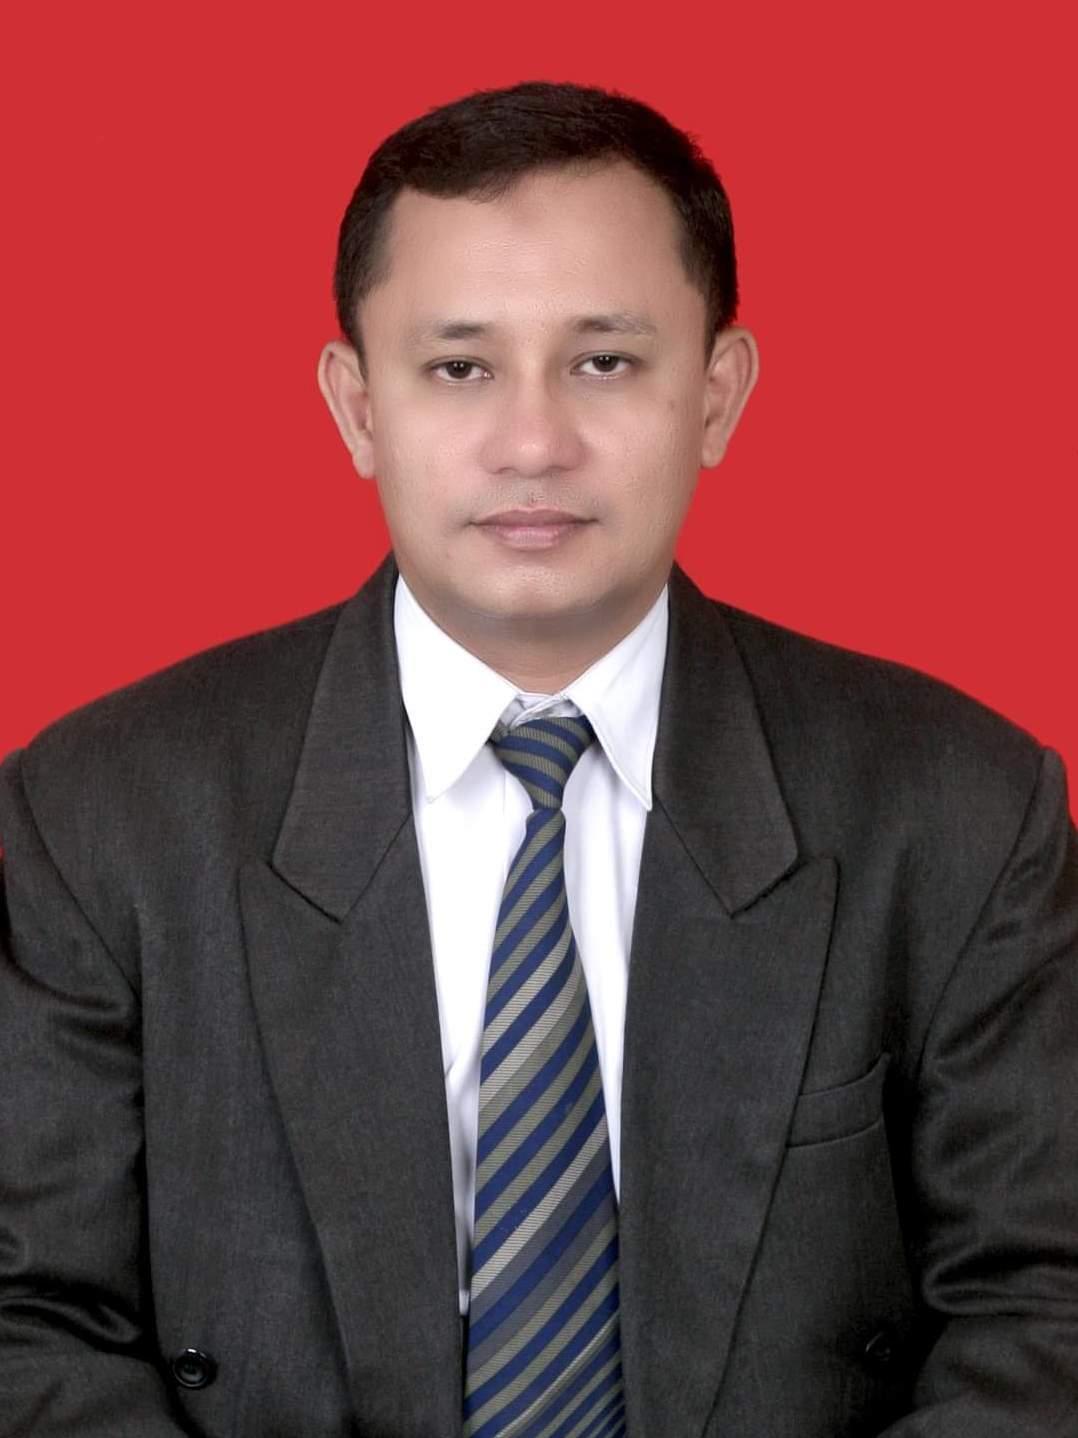 Mohamad Yusuf Ahmad Hasyim